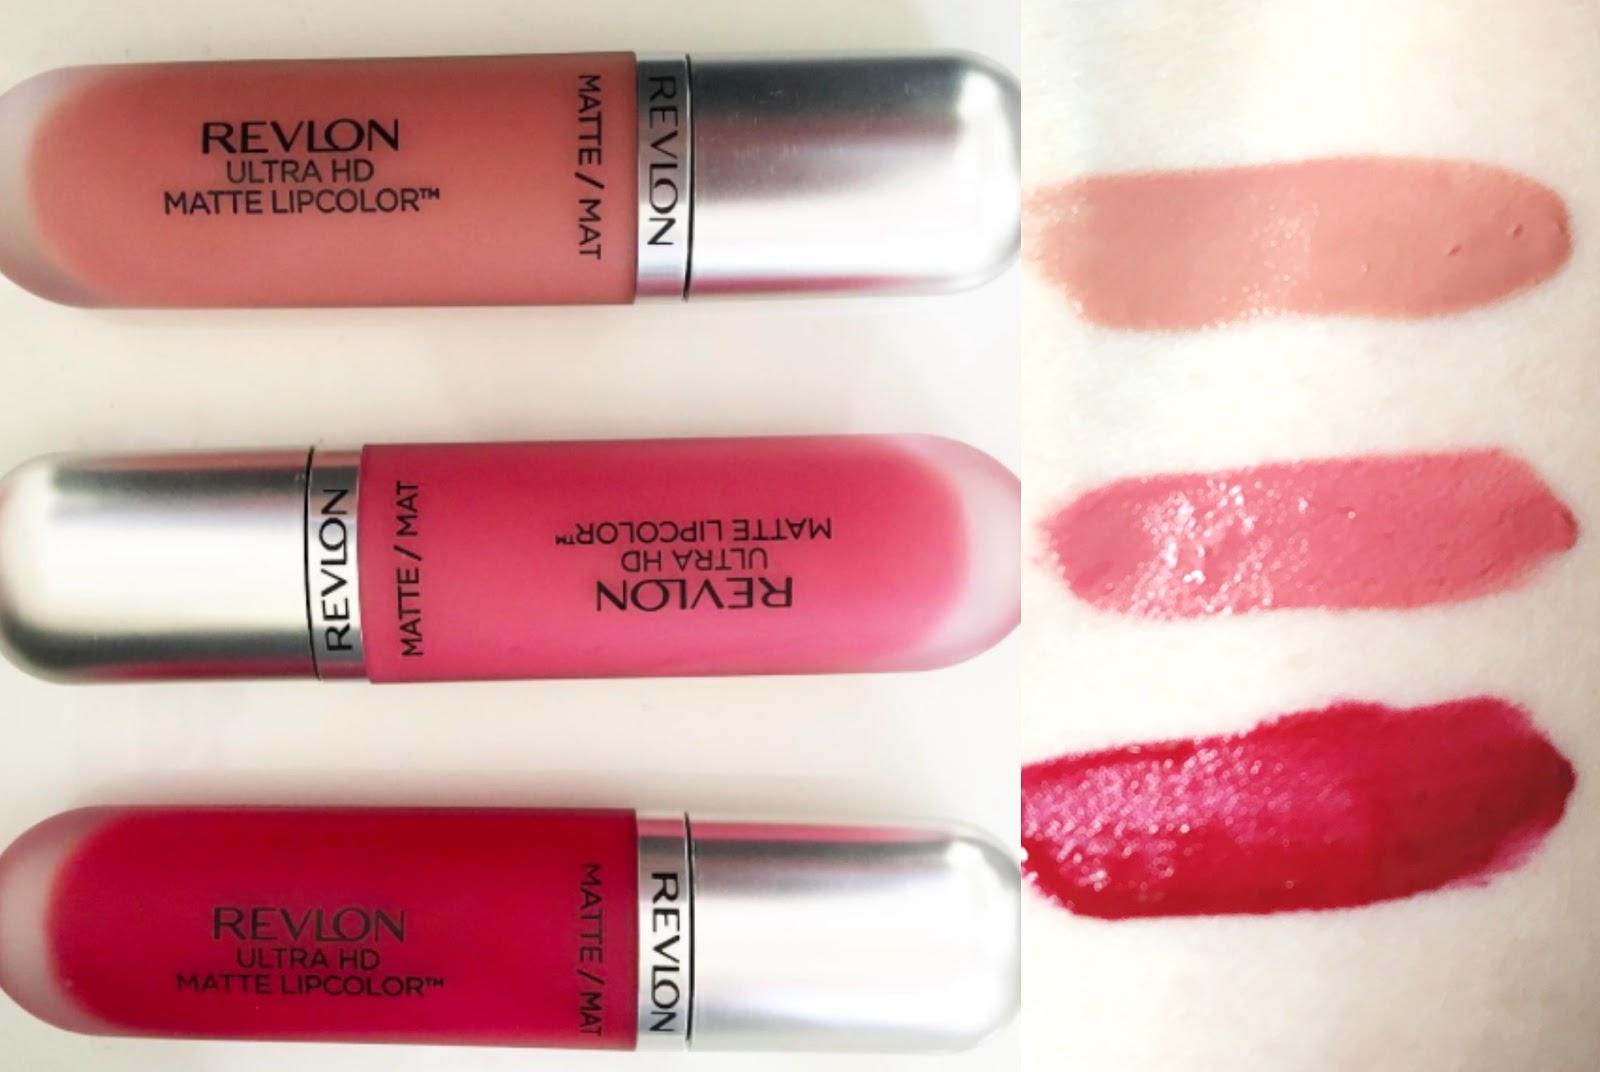 Pin on Revlon new nude lip gloss